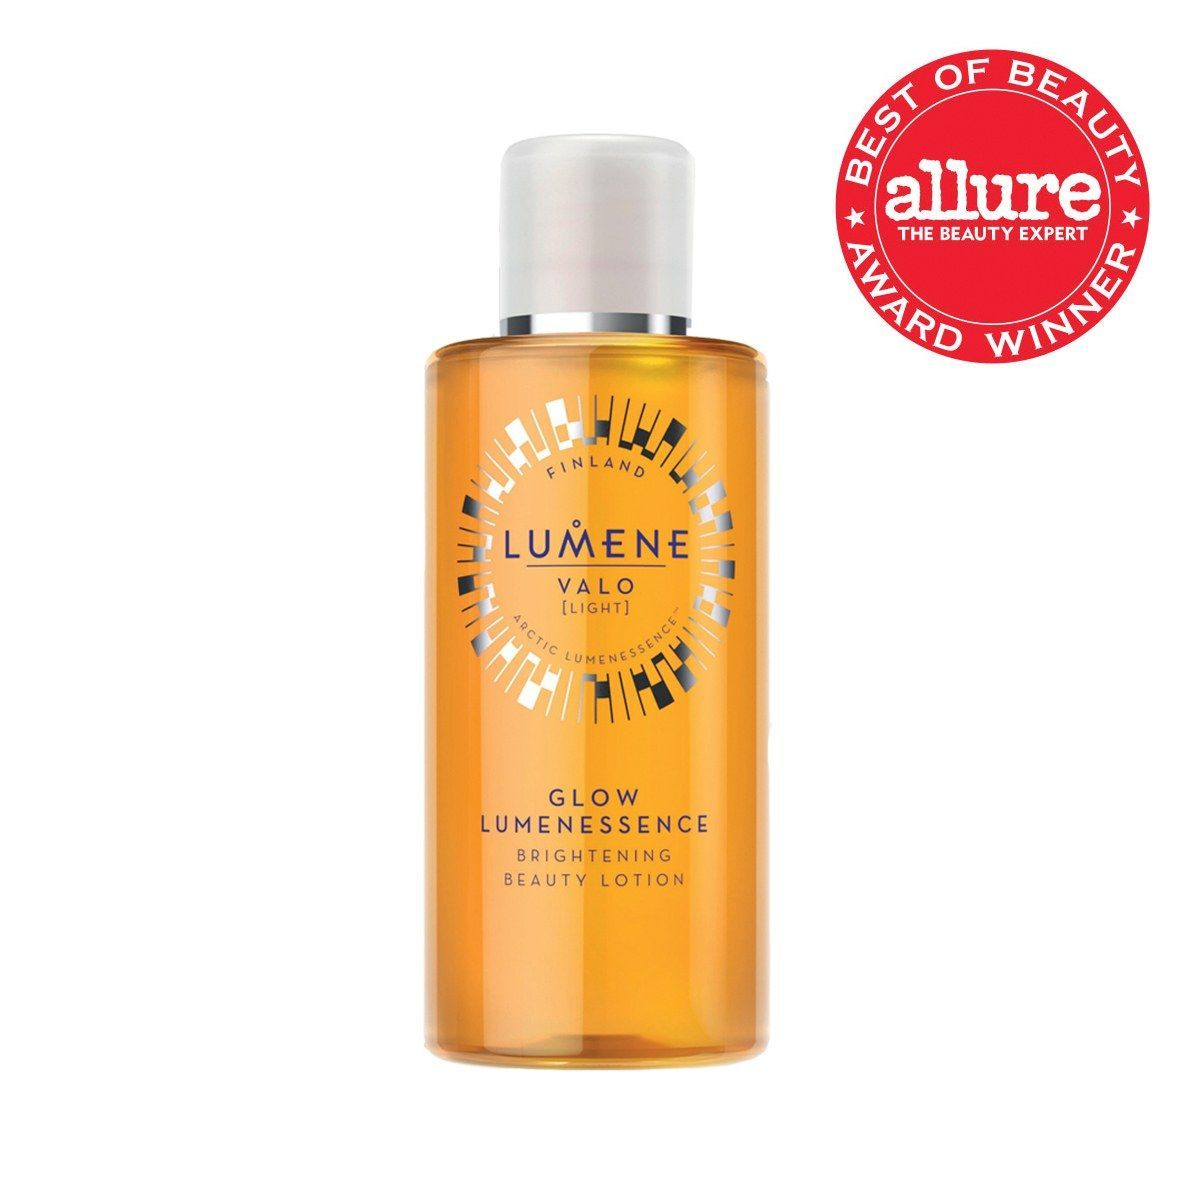 Lumene Products Care Skin